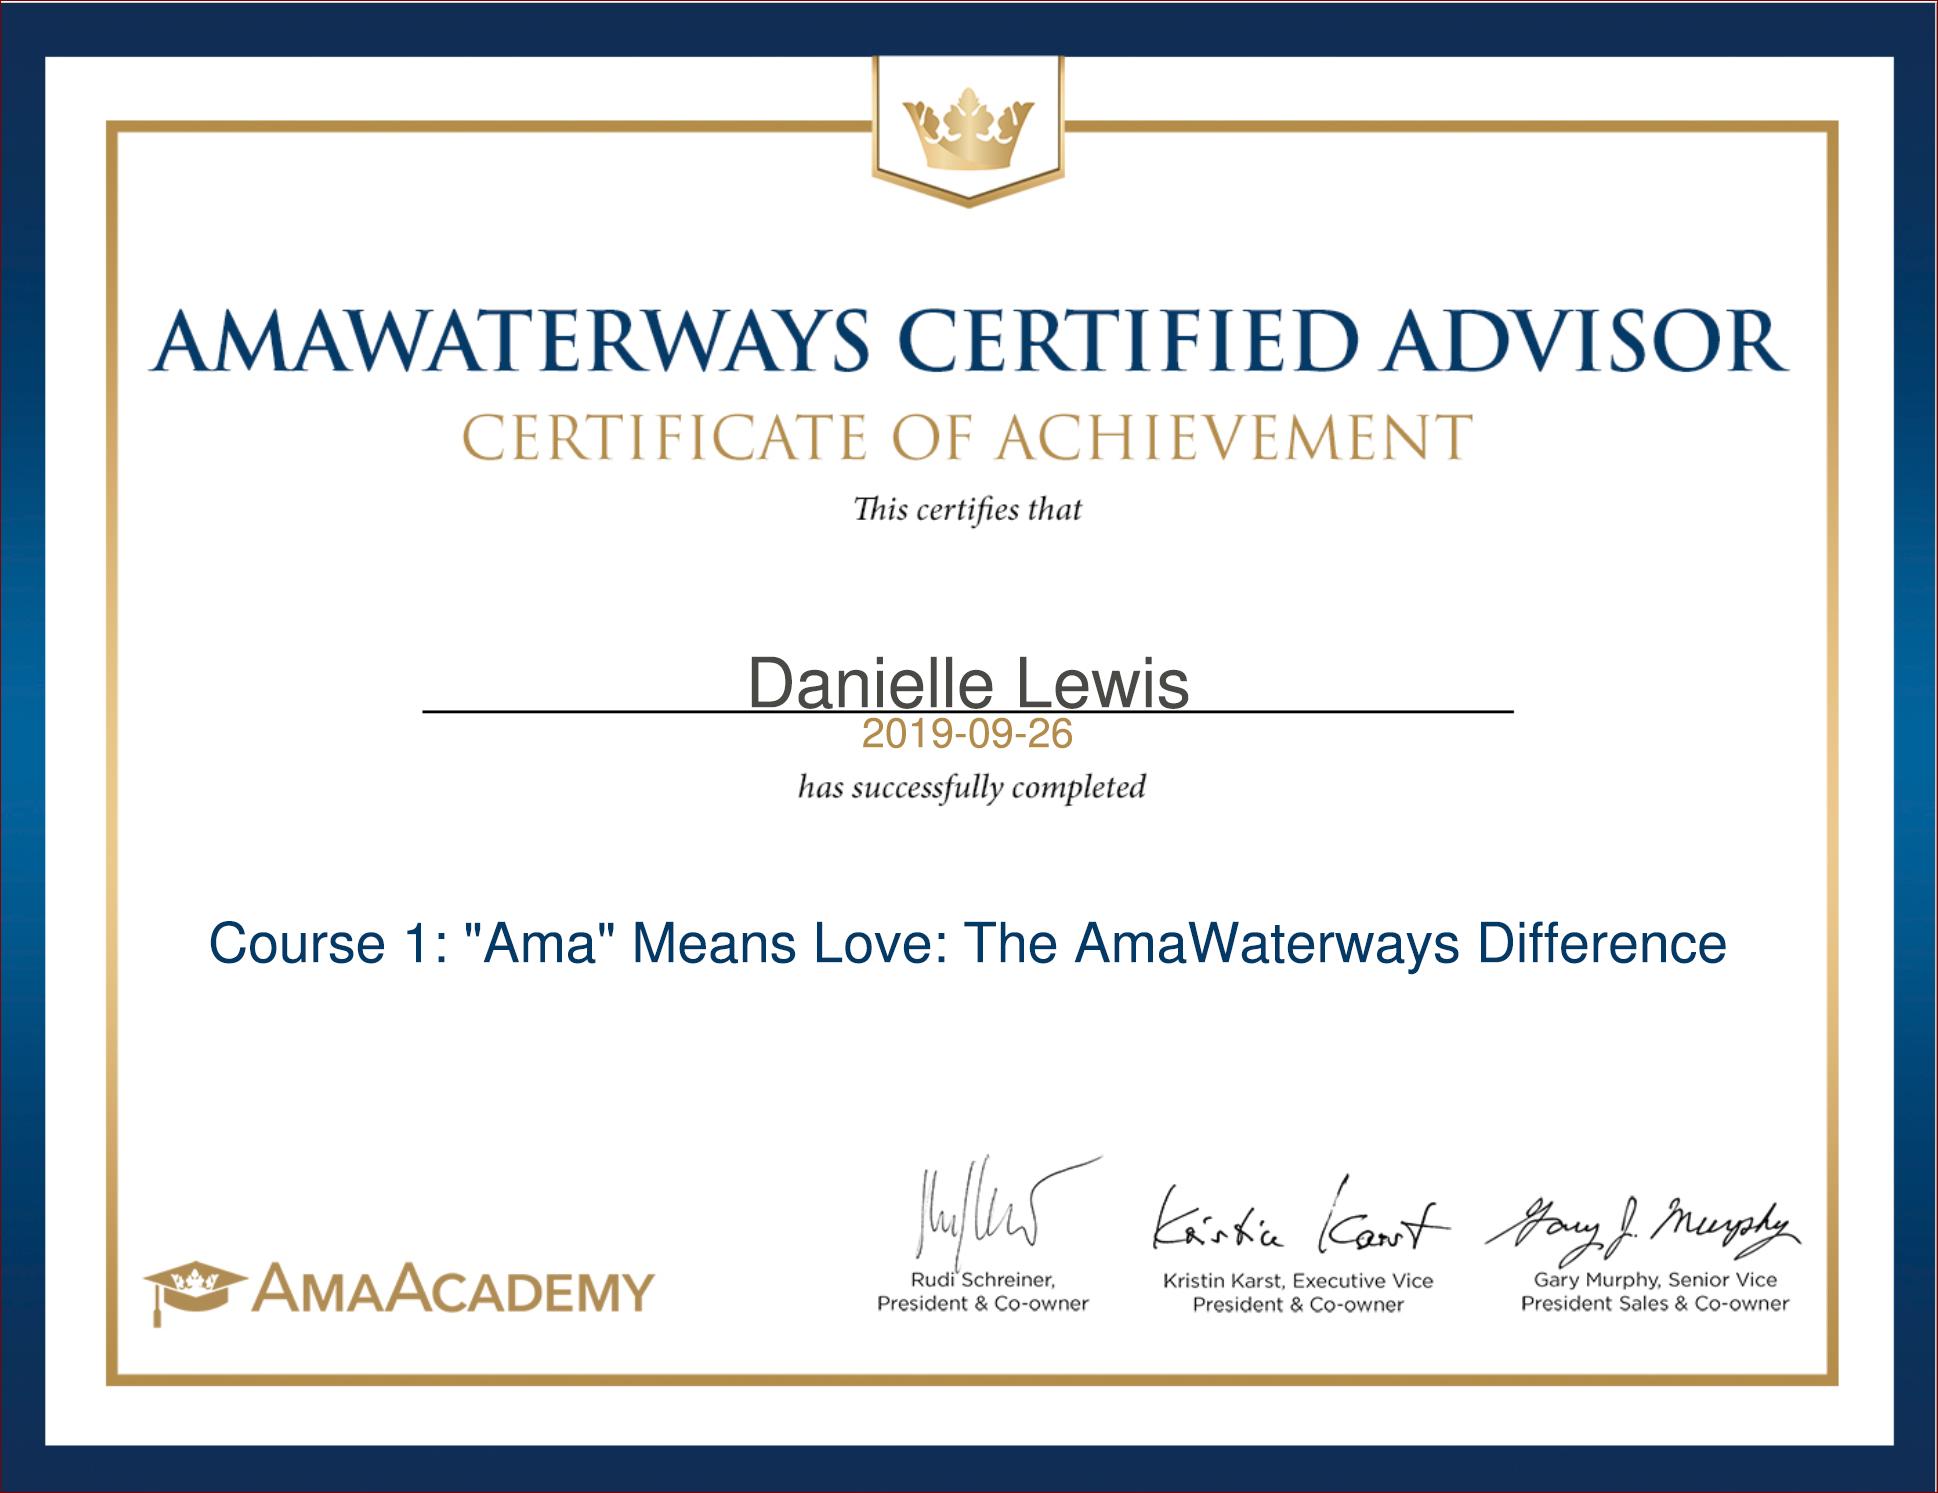 SelfishMe Travel - AmaWaterways Certified Advisor